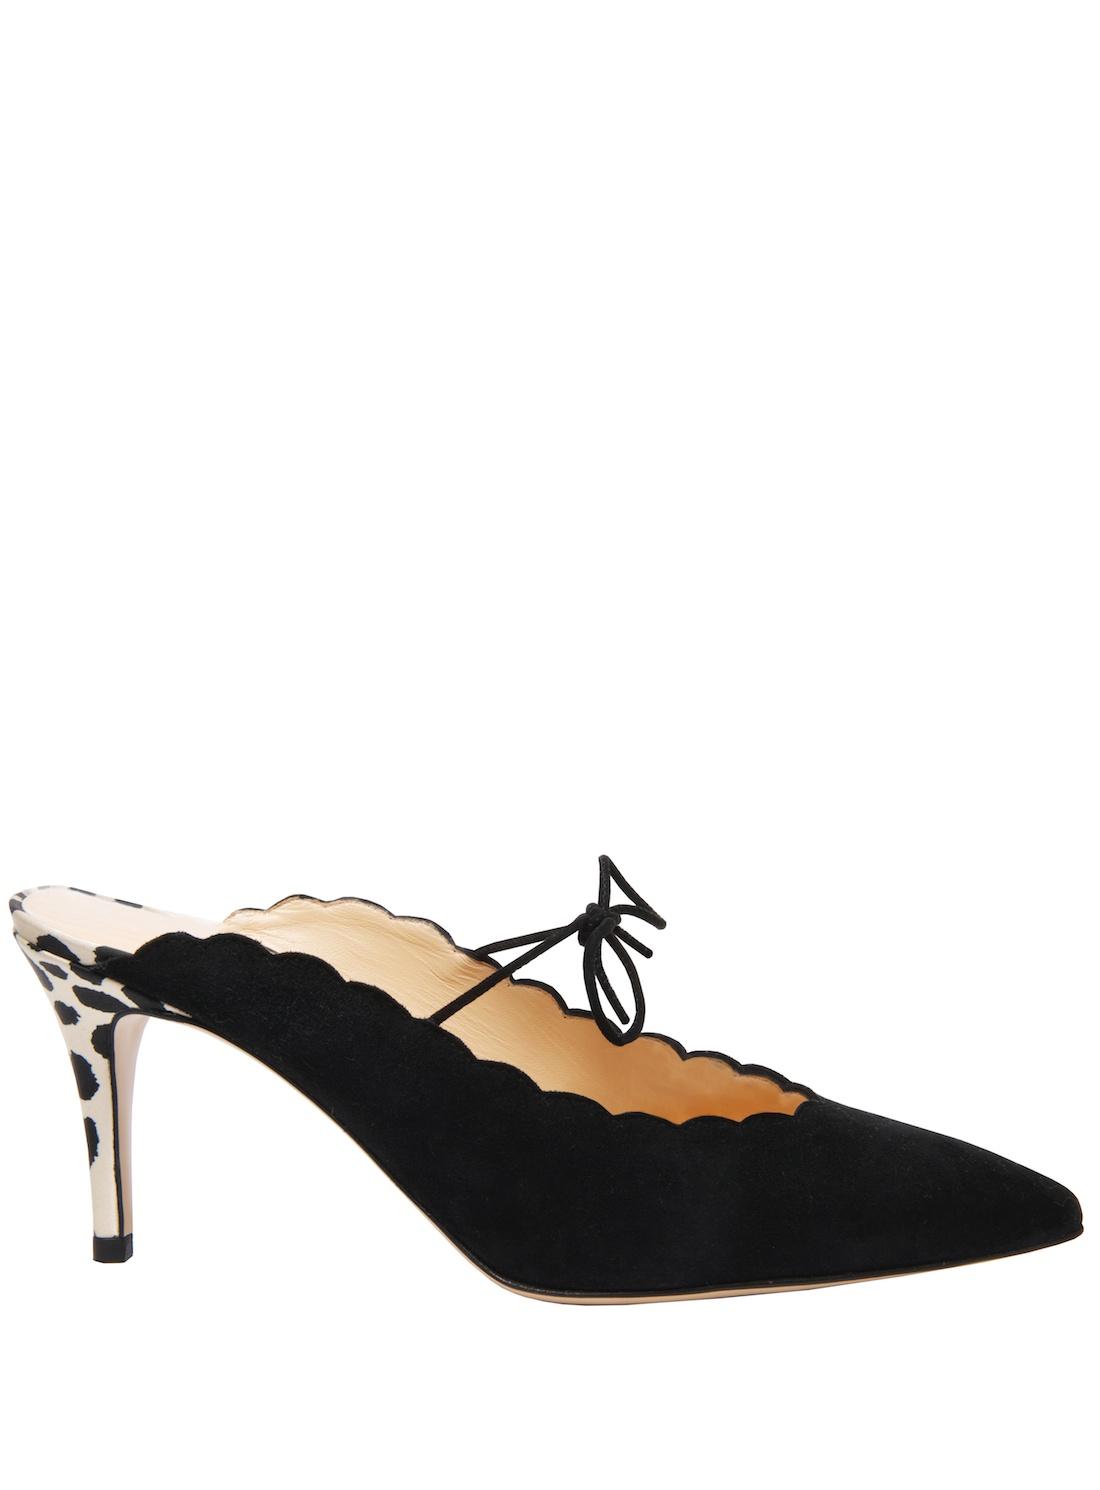 Bionda castana Marion Black Kitten Heel Mules By in Black | Lyst